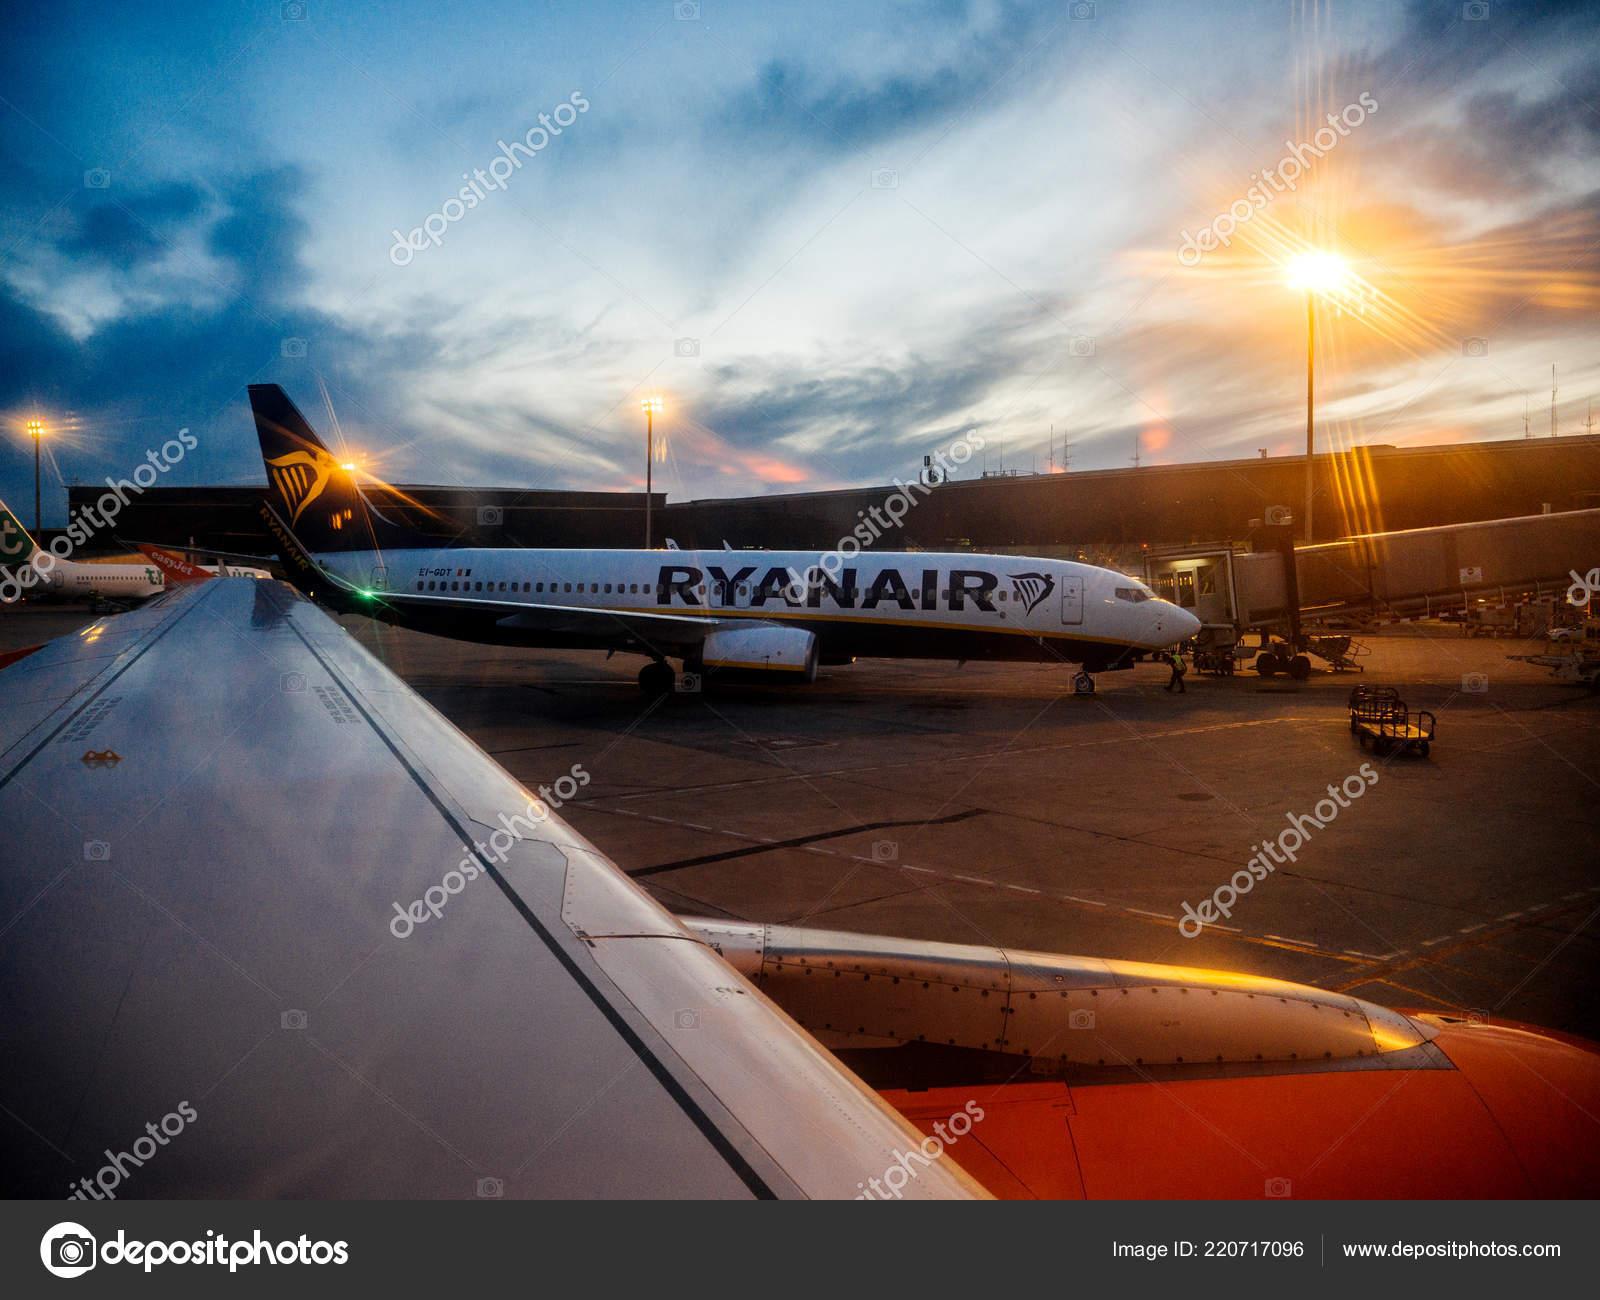 Обои ночь, Boeing 737, Самолёт, b737, tuifly, aircraft. Авиация foto 7